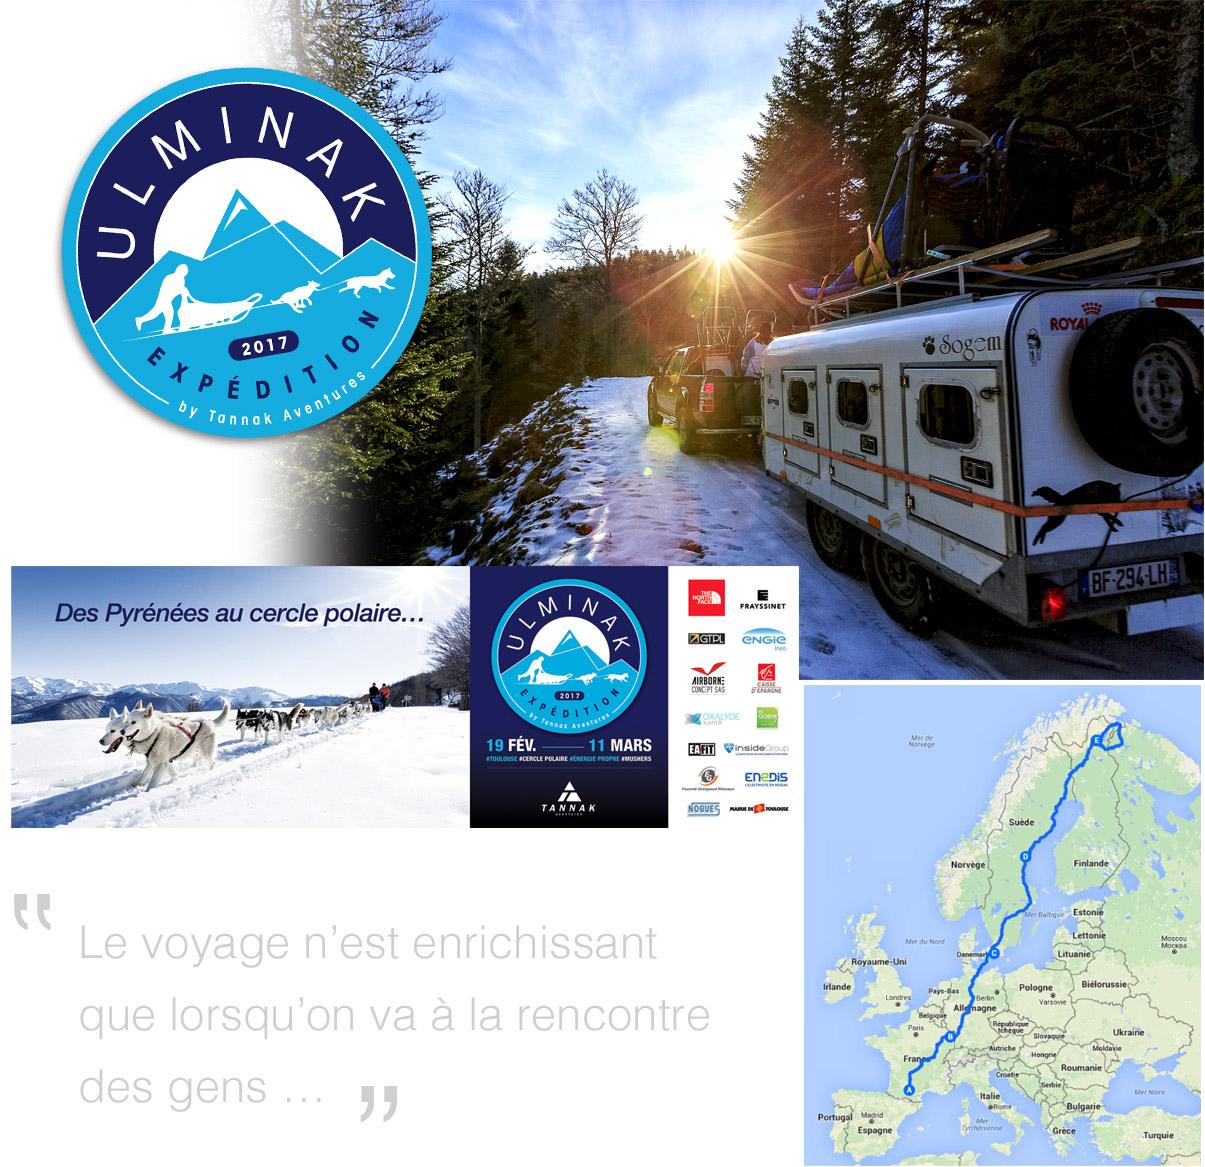 Ulminak expédition by Tannak Aventures - © ovarma creative studio